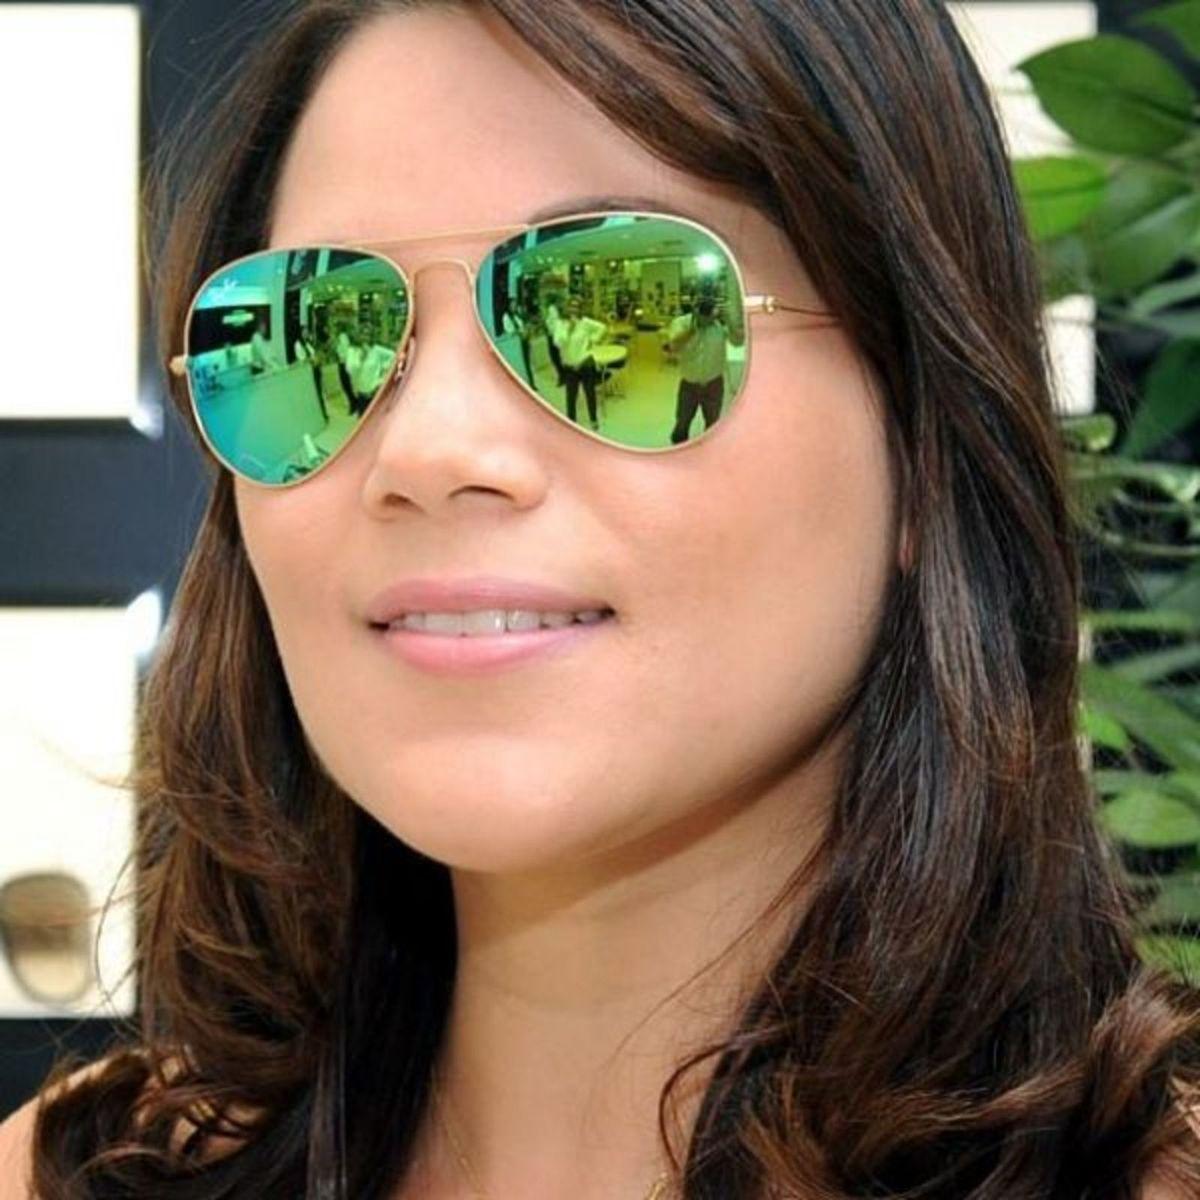 ray-ban aviador original dourado verde espelhado médio - óculos ray-ban 36e70ed24c